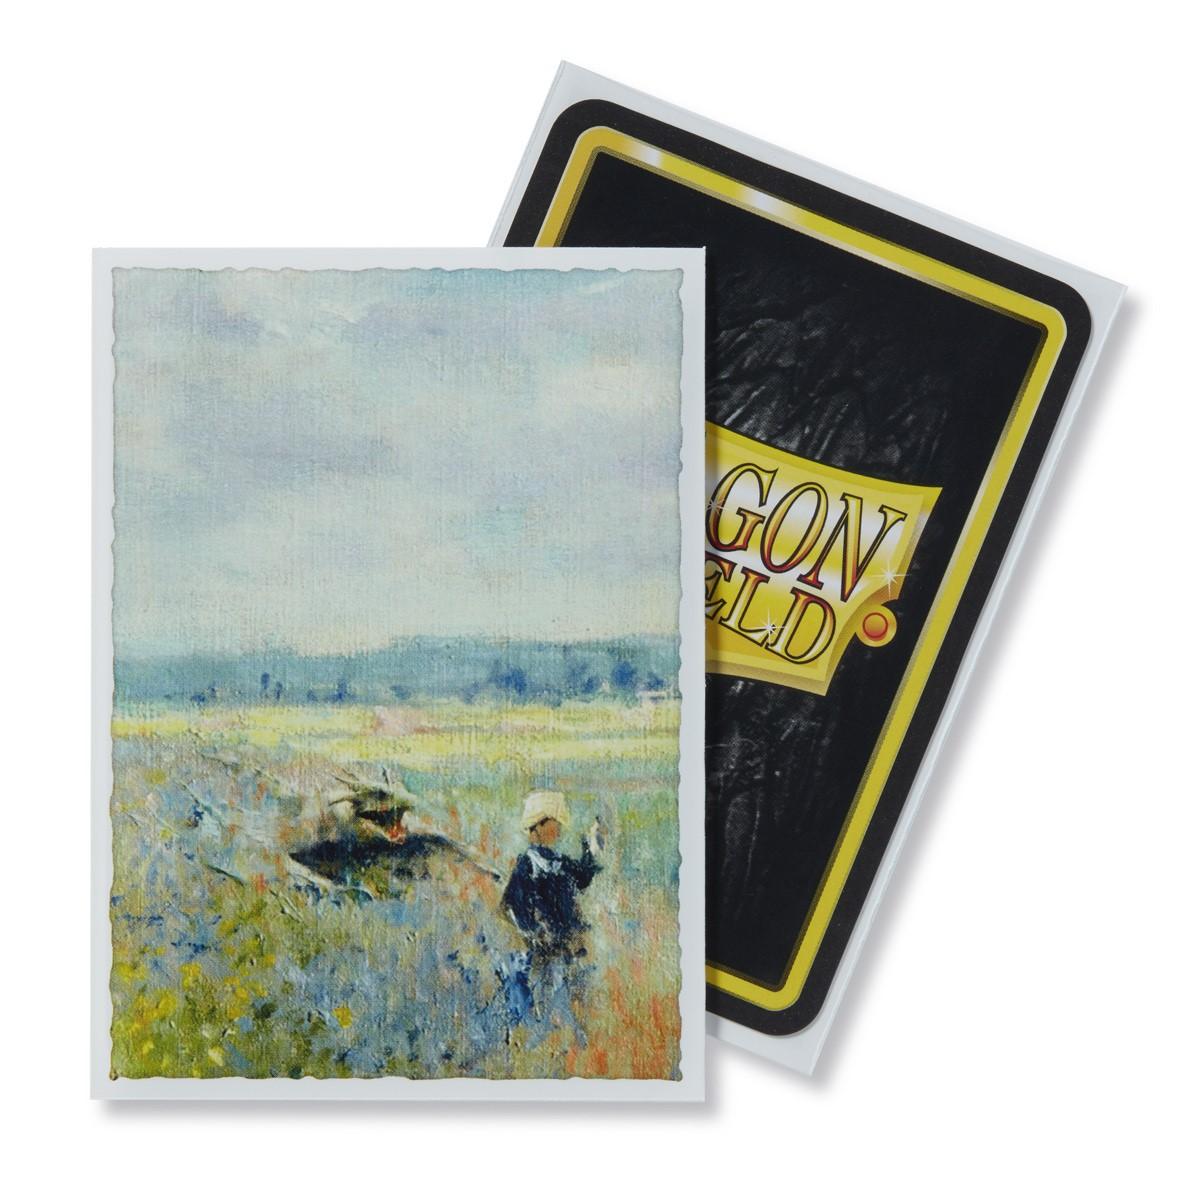 Dragon Shields: (100) Art Sleeves Classic Poppy Field Game Box